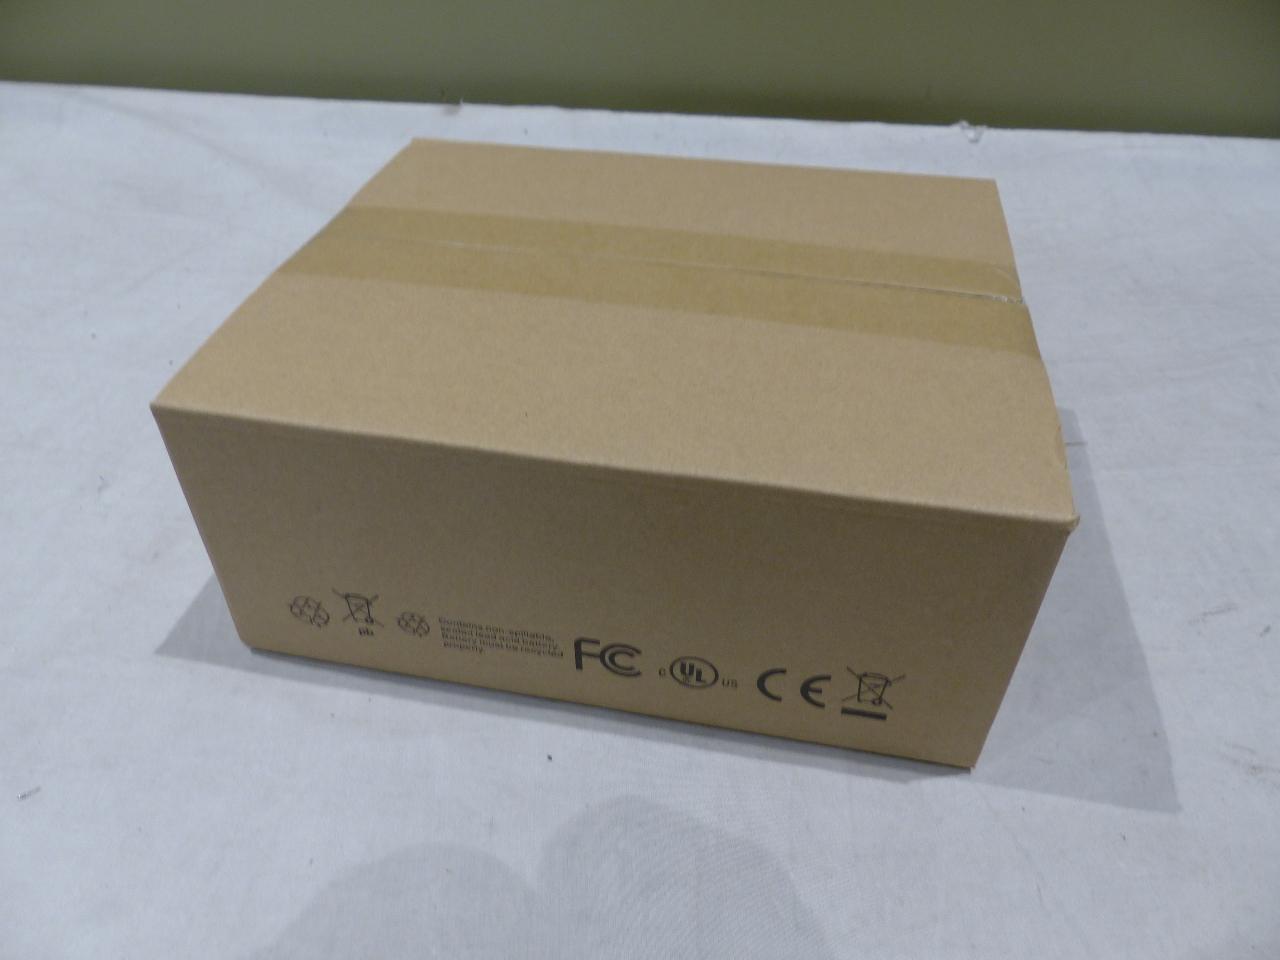 At T Nokia Cyber Power Supply Att3612v3s Uverse Backup W O Battery Mdg Sales Llc